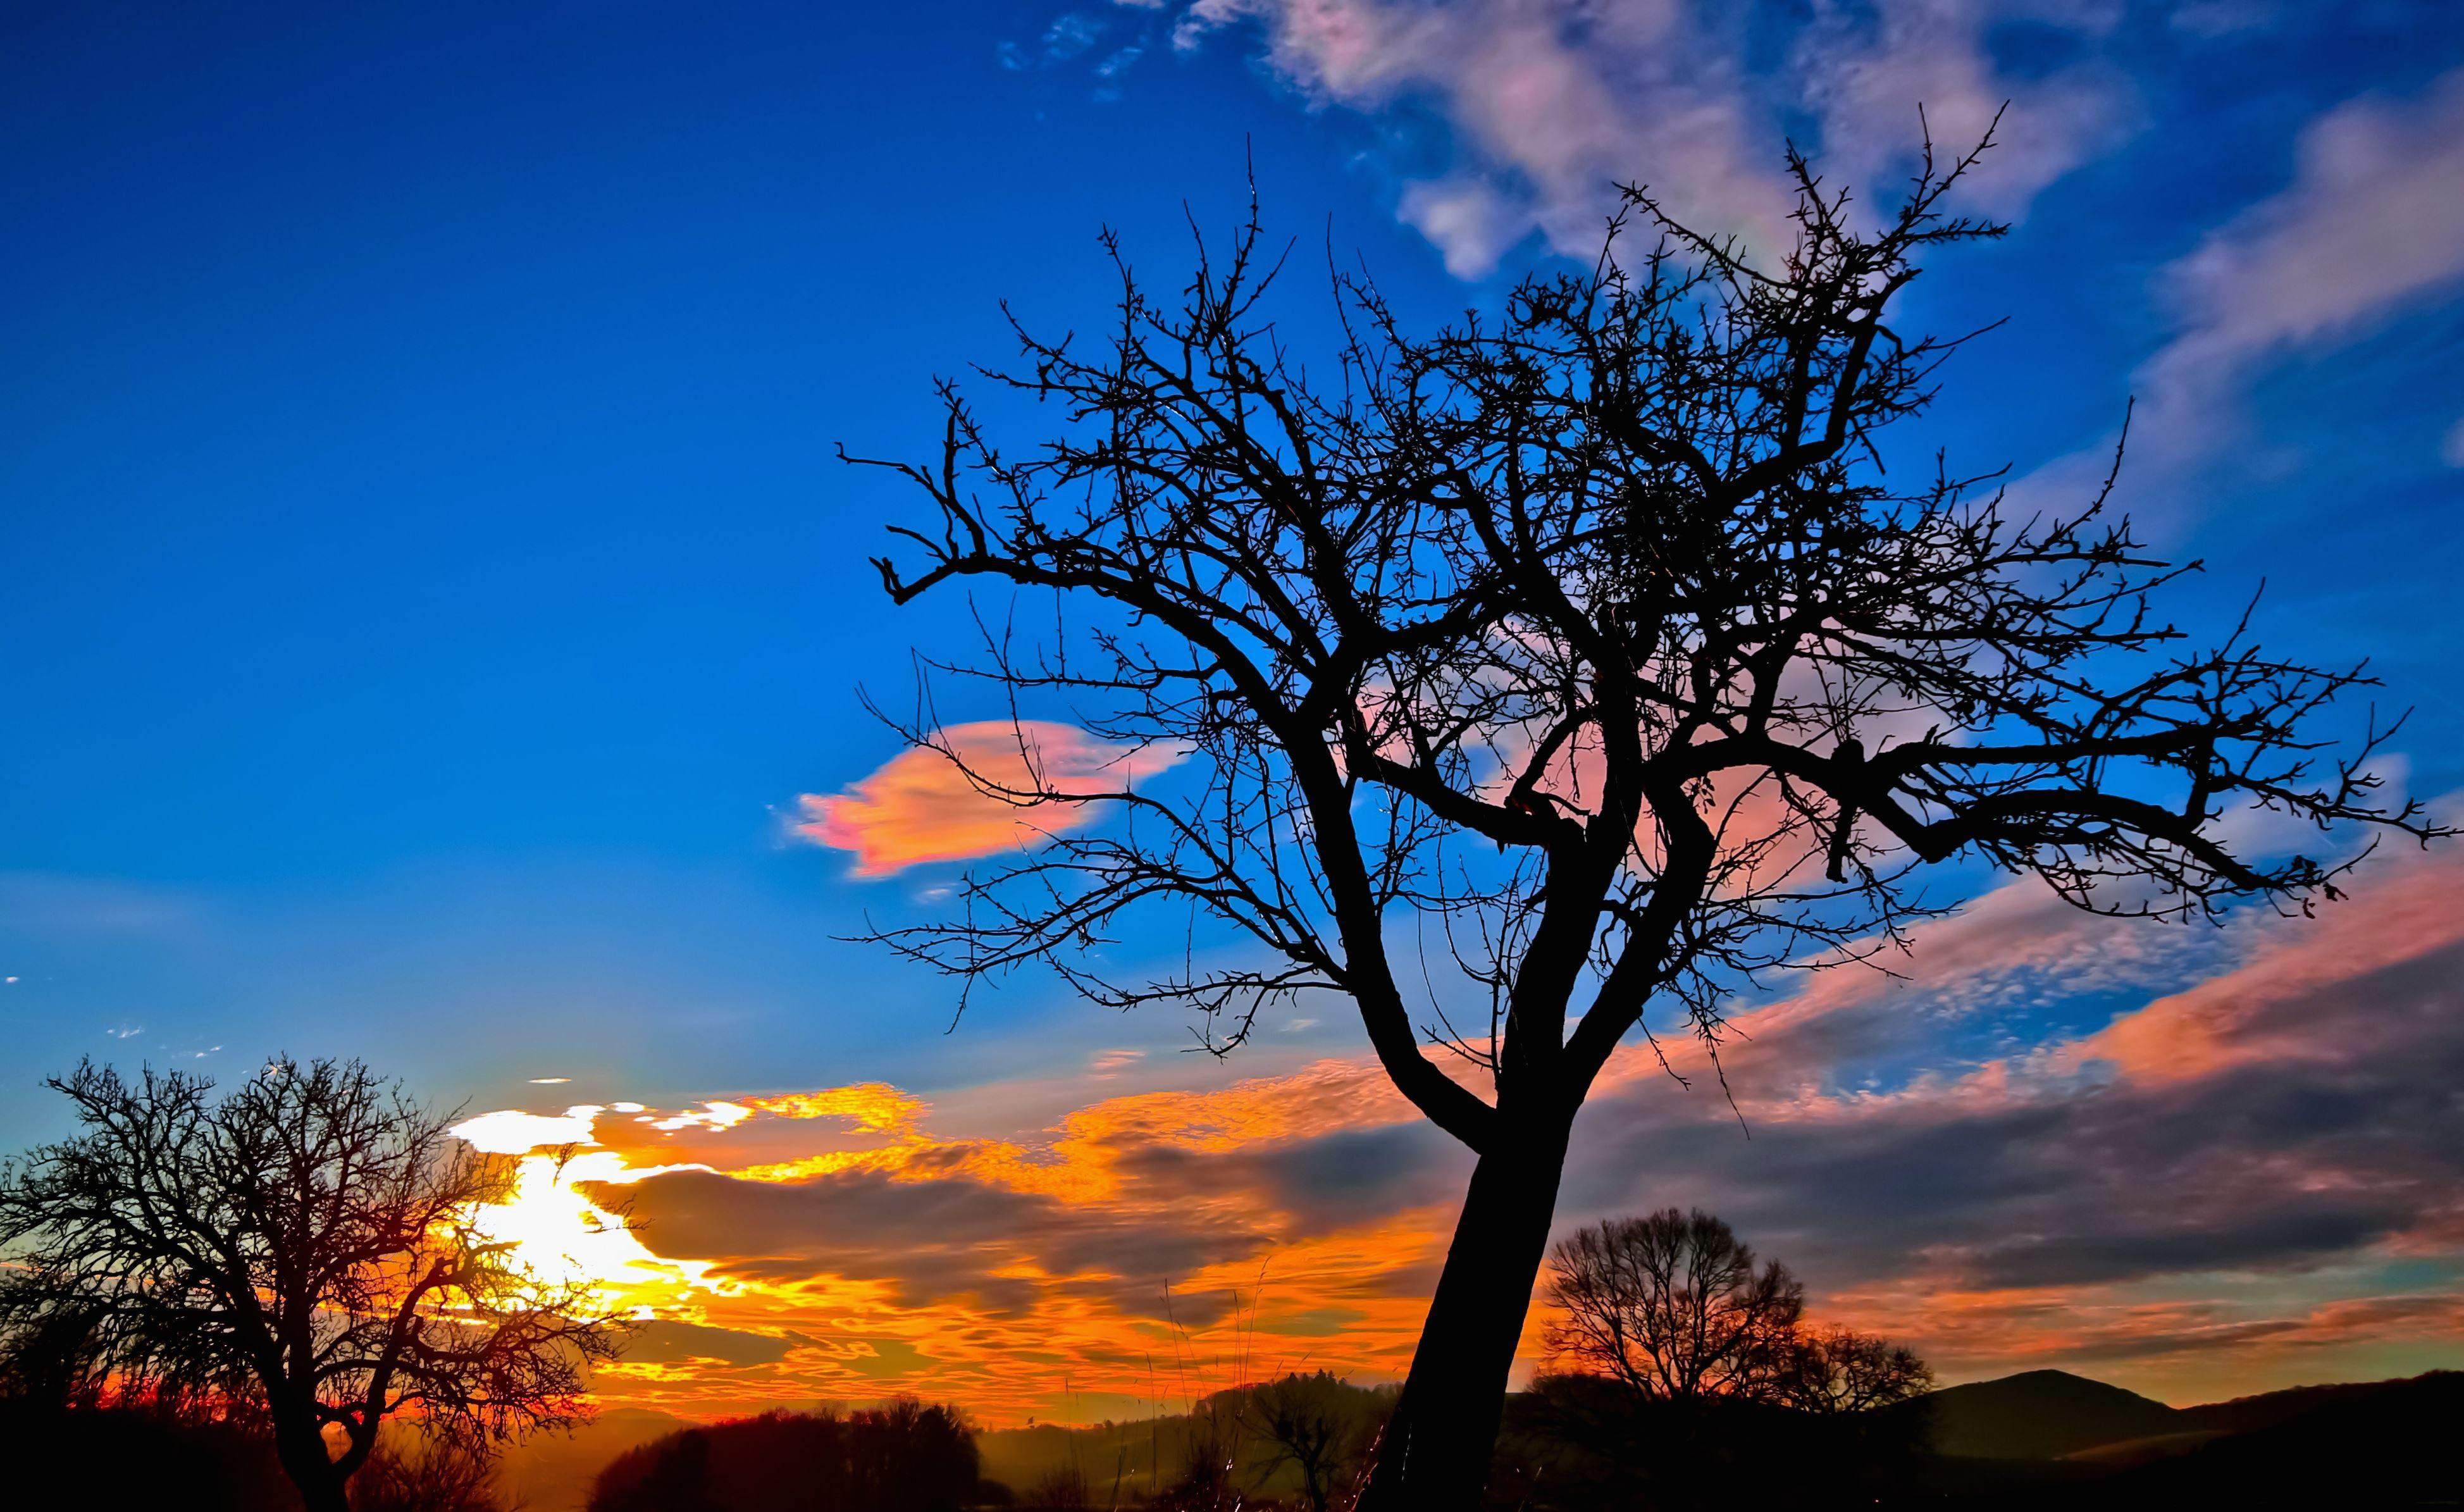 Free photo: Sky, Clouds, Sunset, Tree - Free Image on Pixabay ...